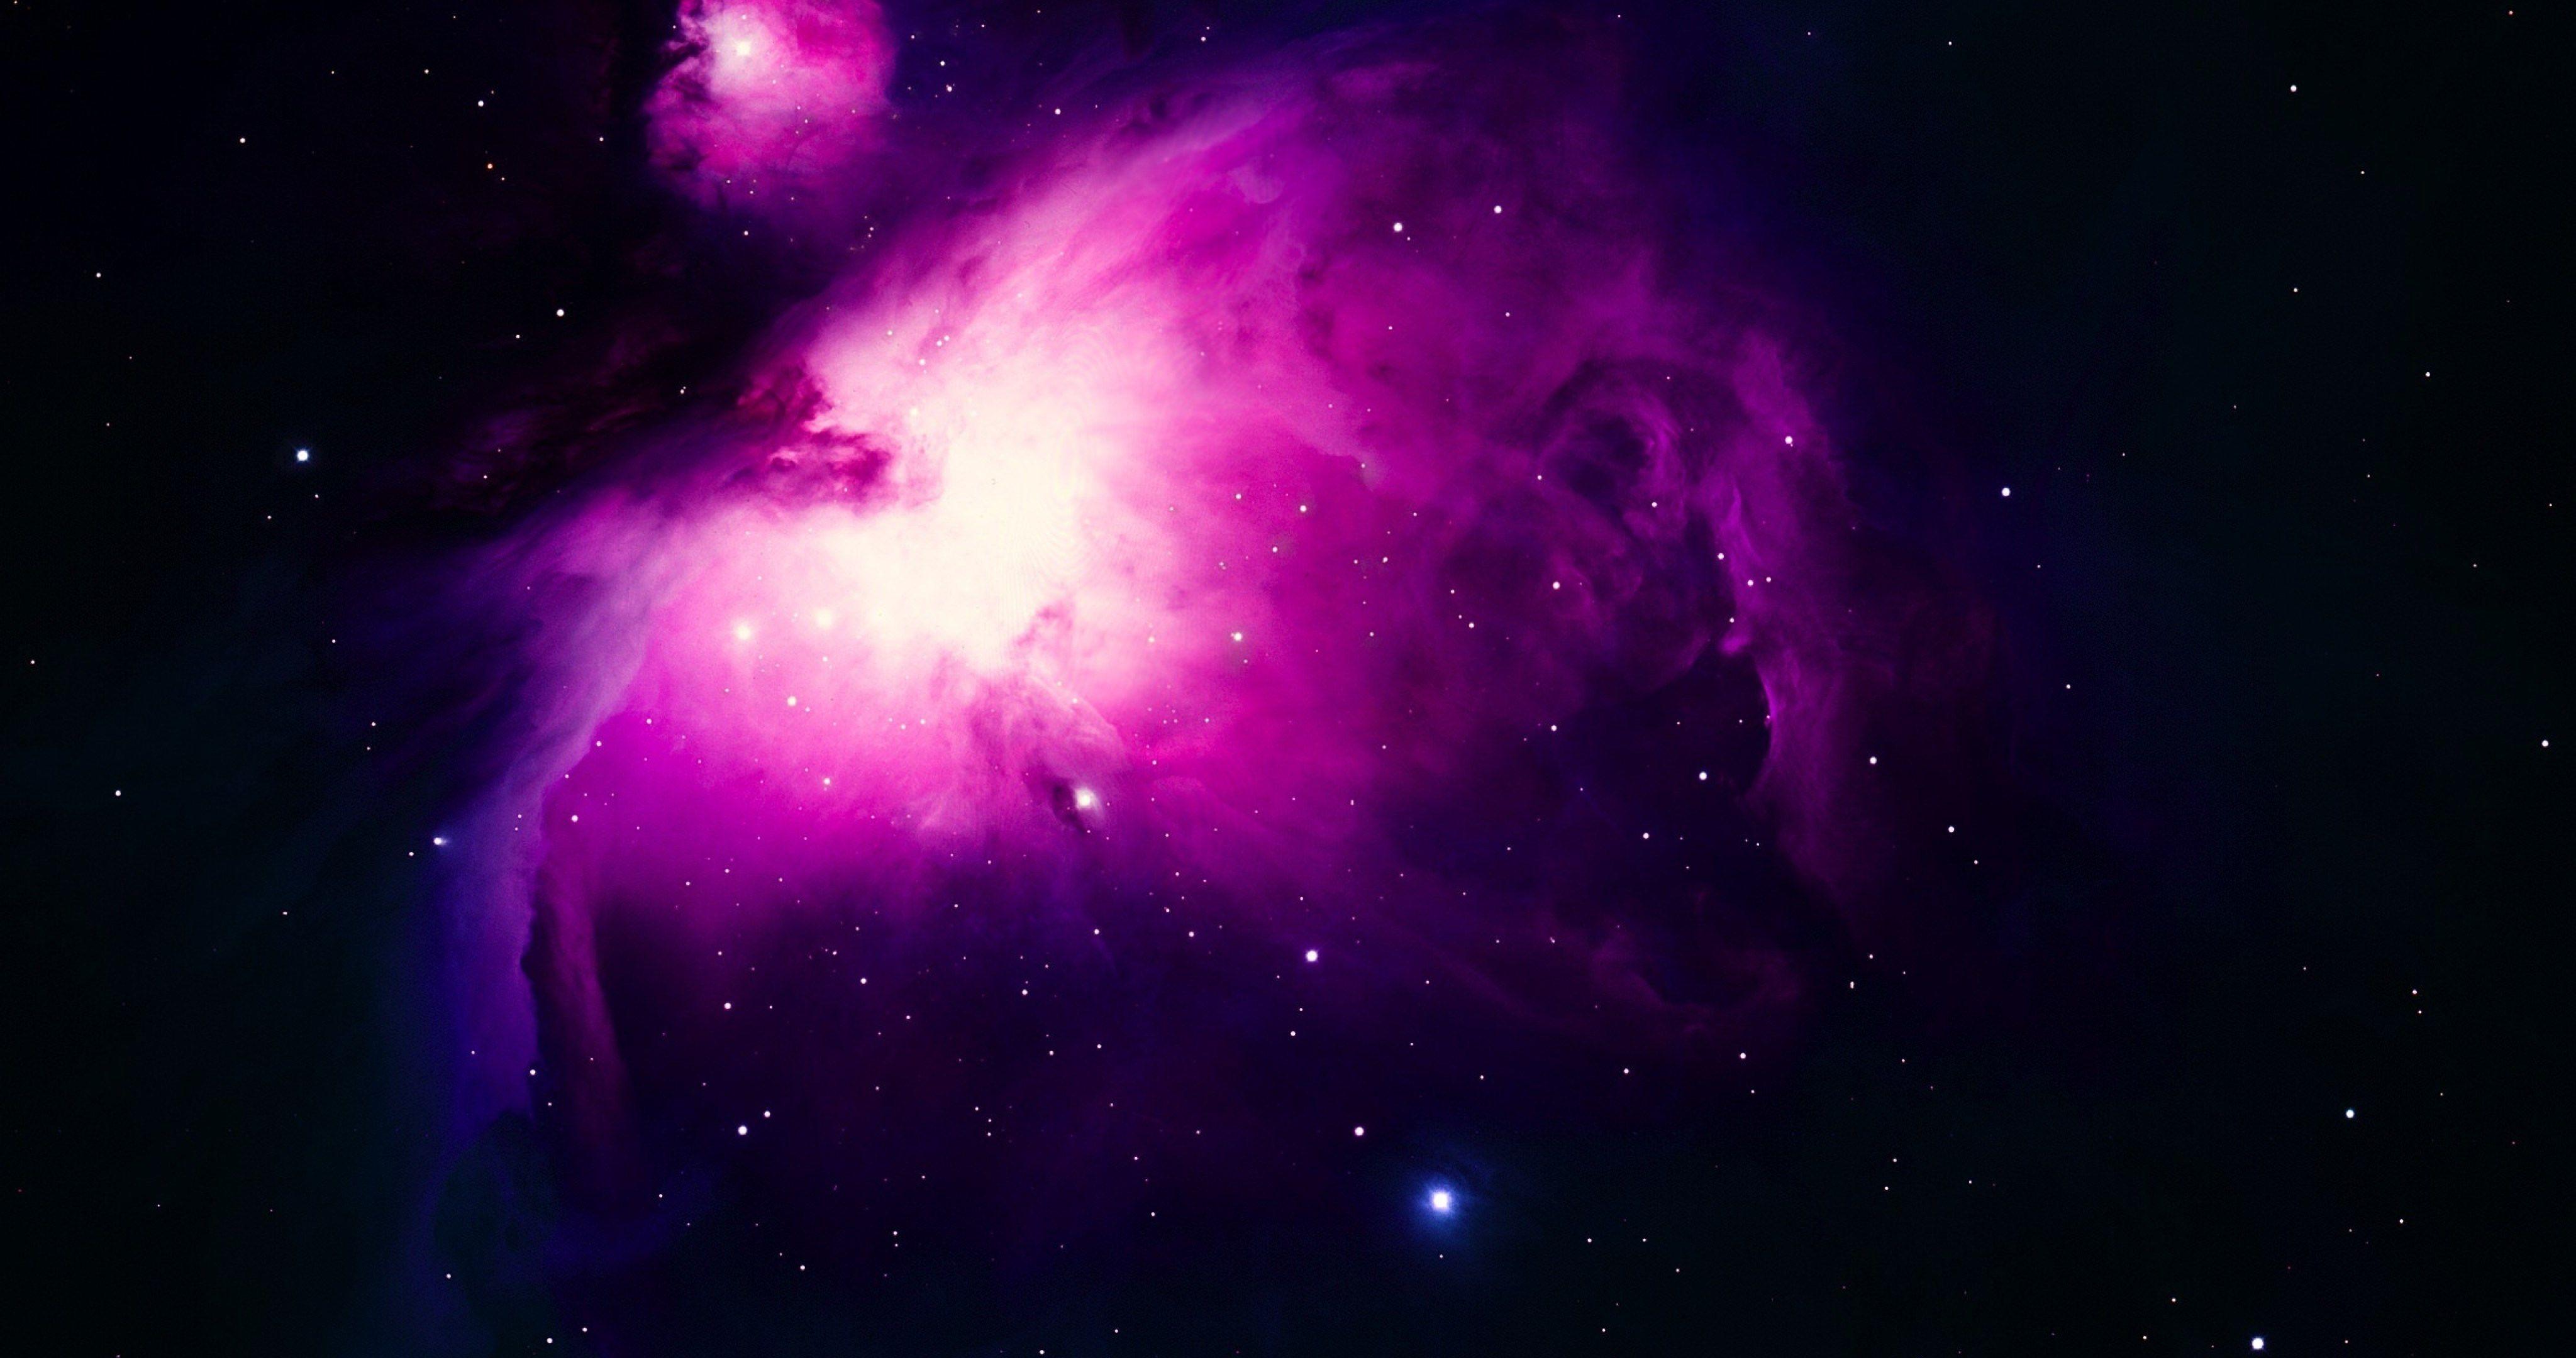 Violet Nebula Space 4k Ultra Hd Wallpaper